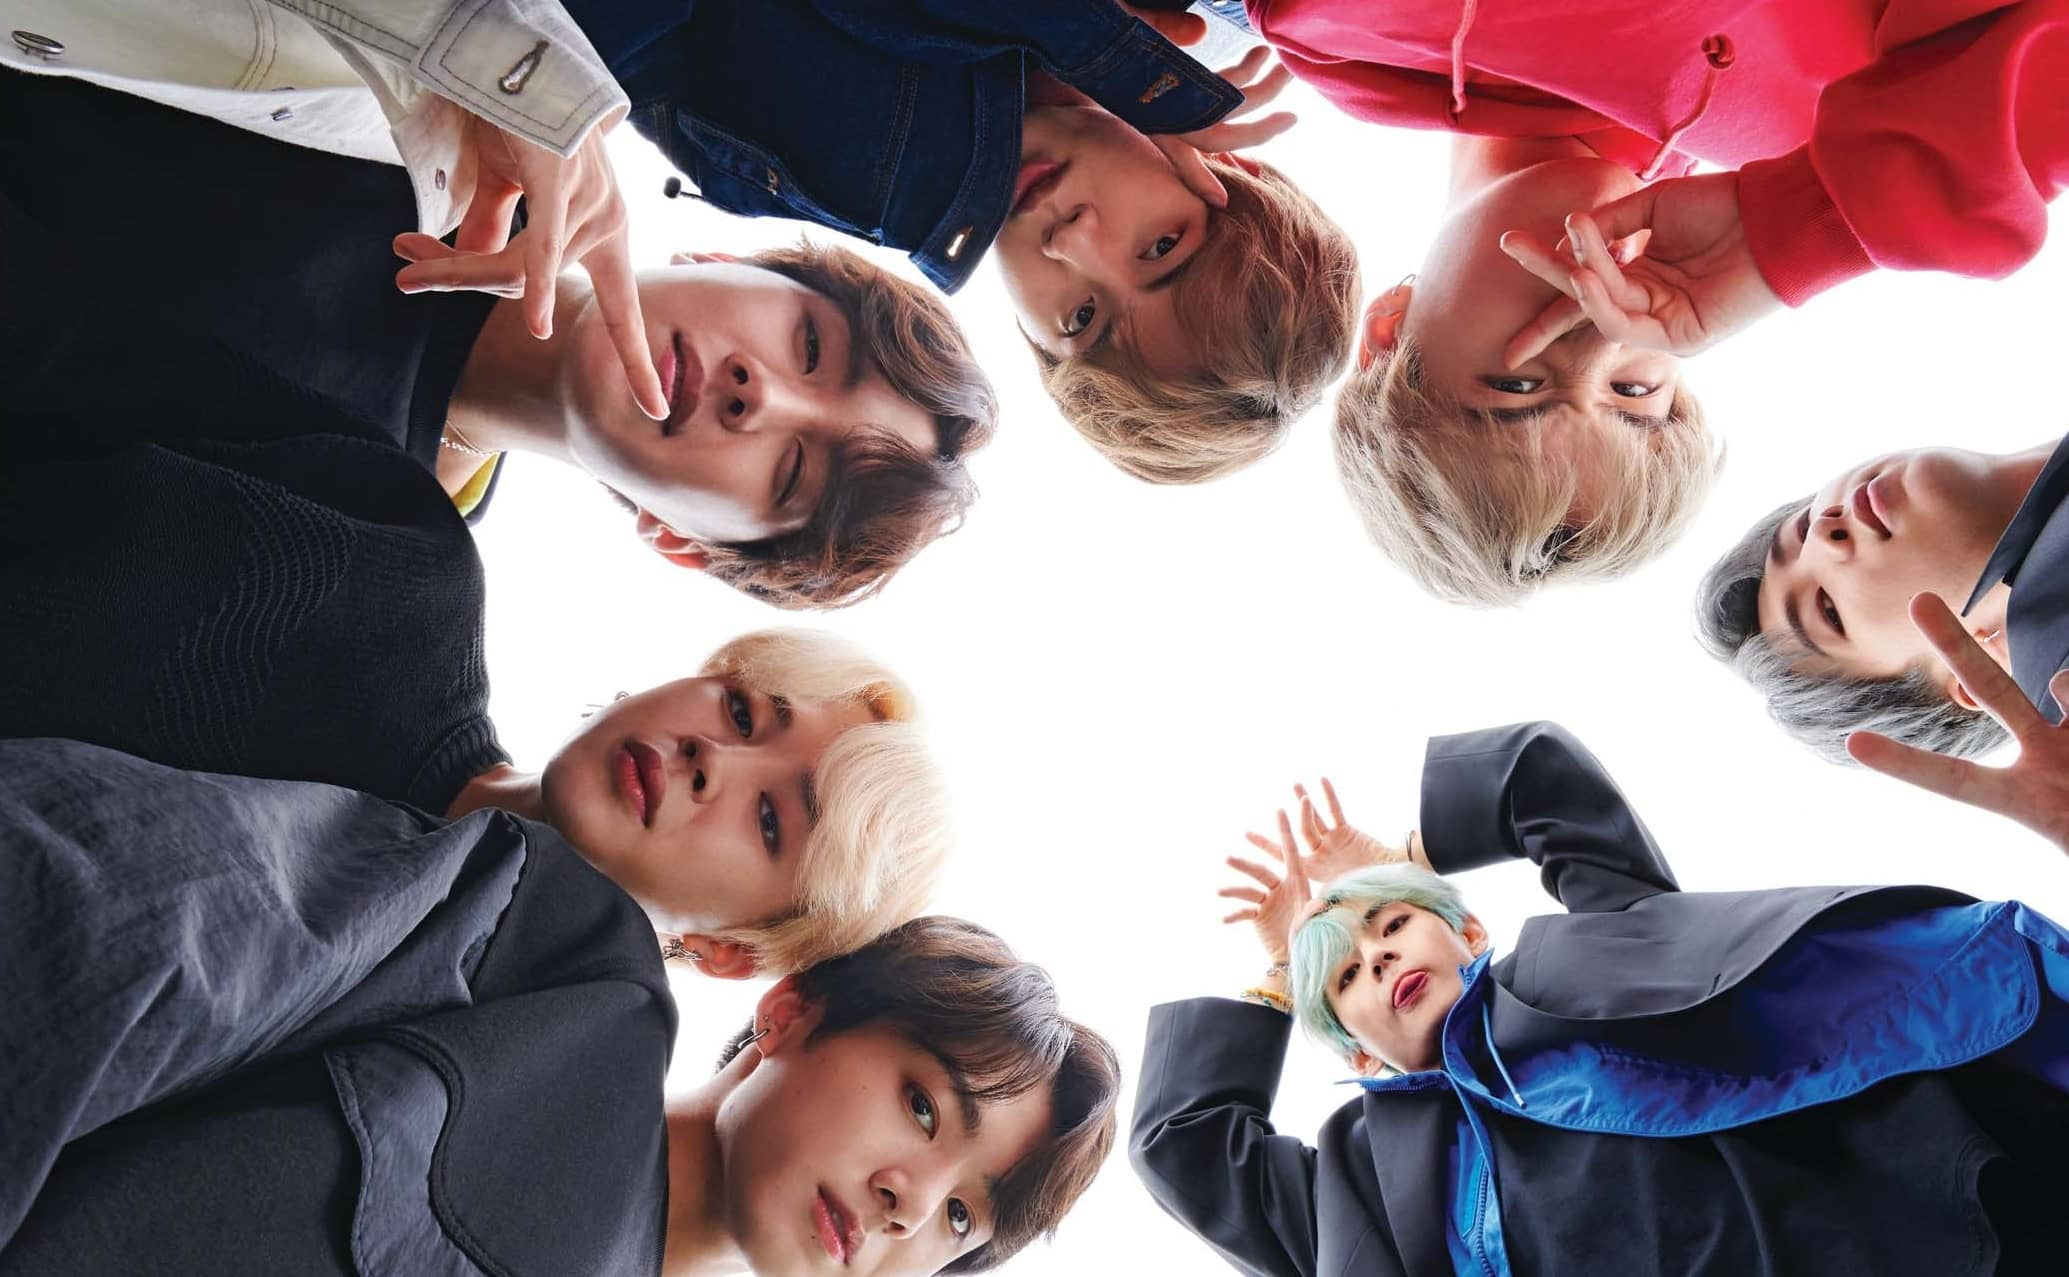 BTS - The Greatest Show Men